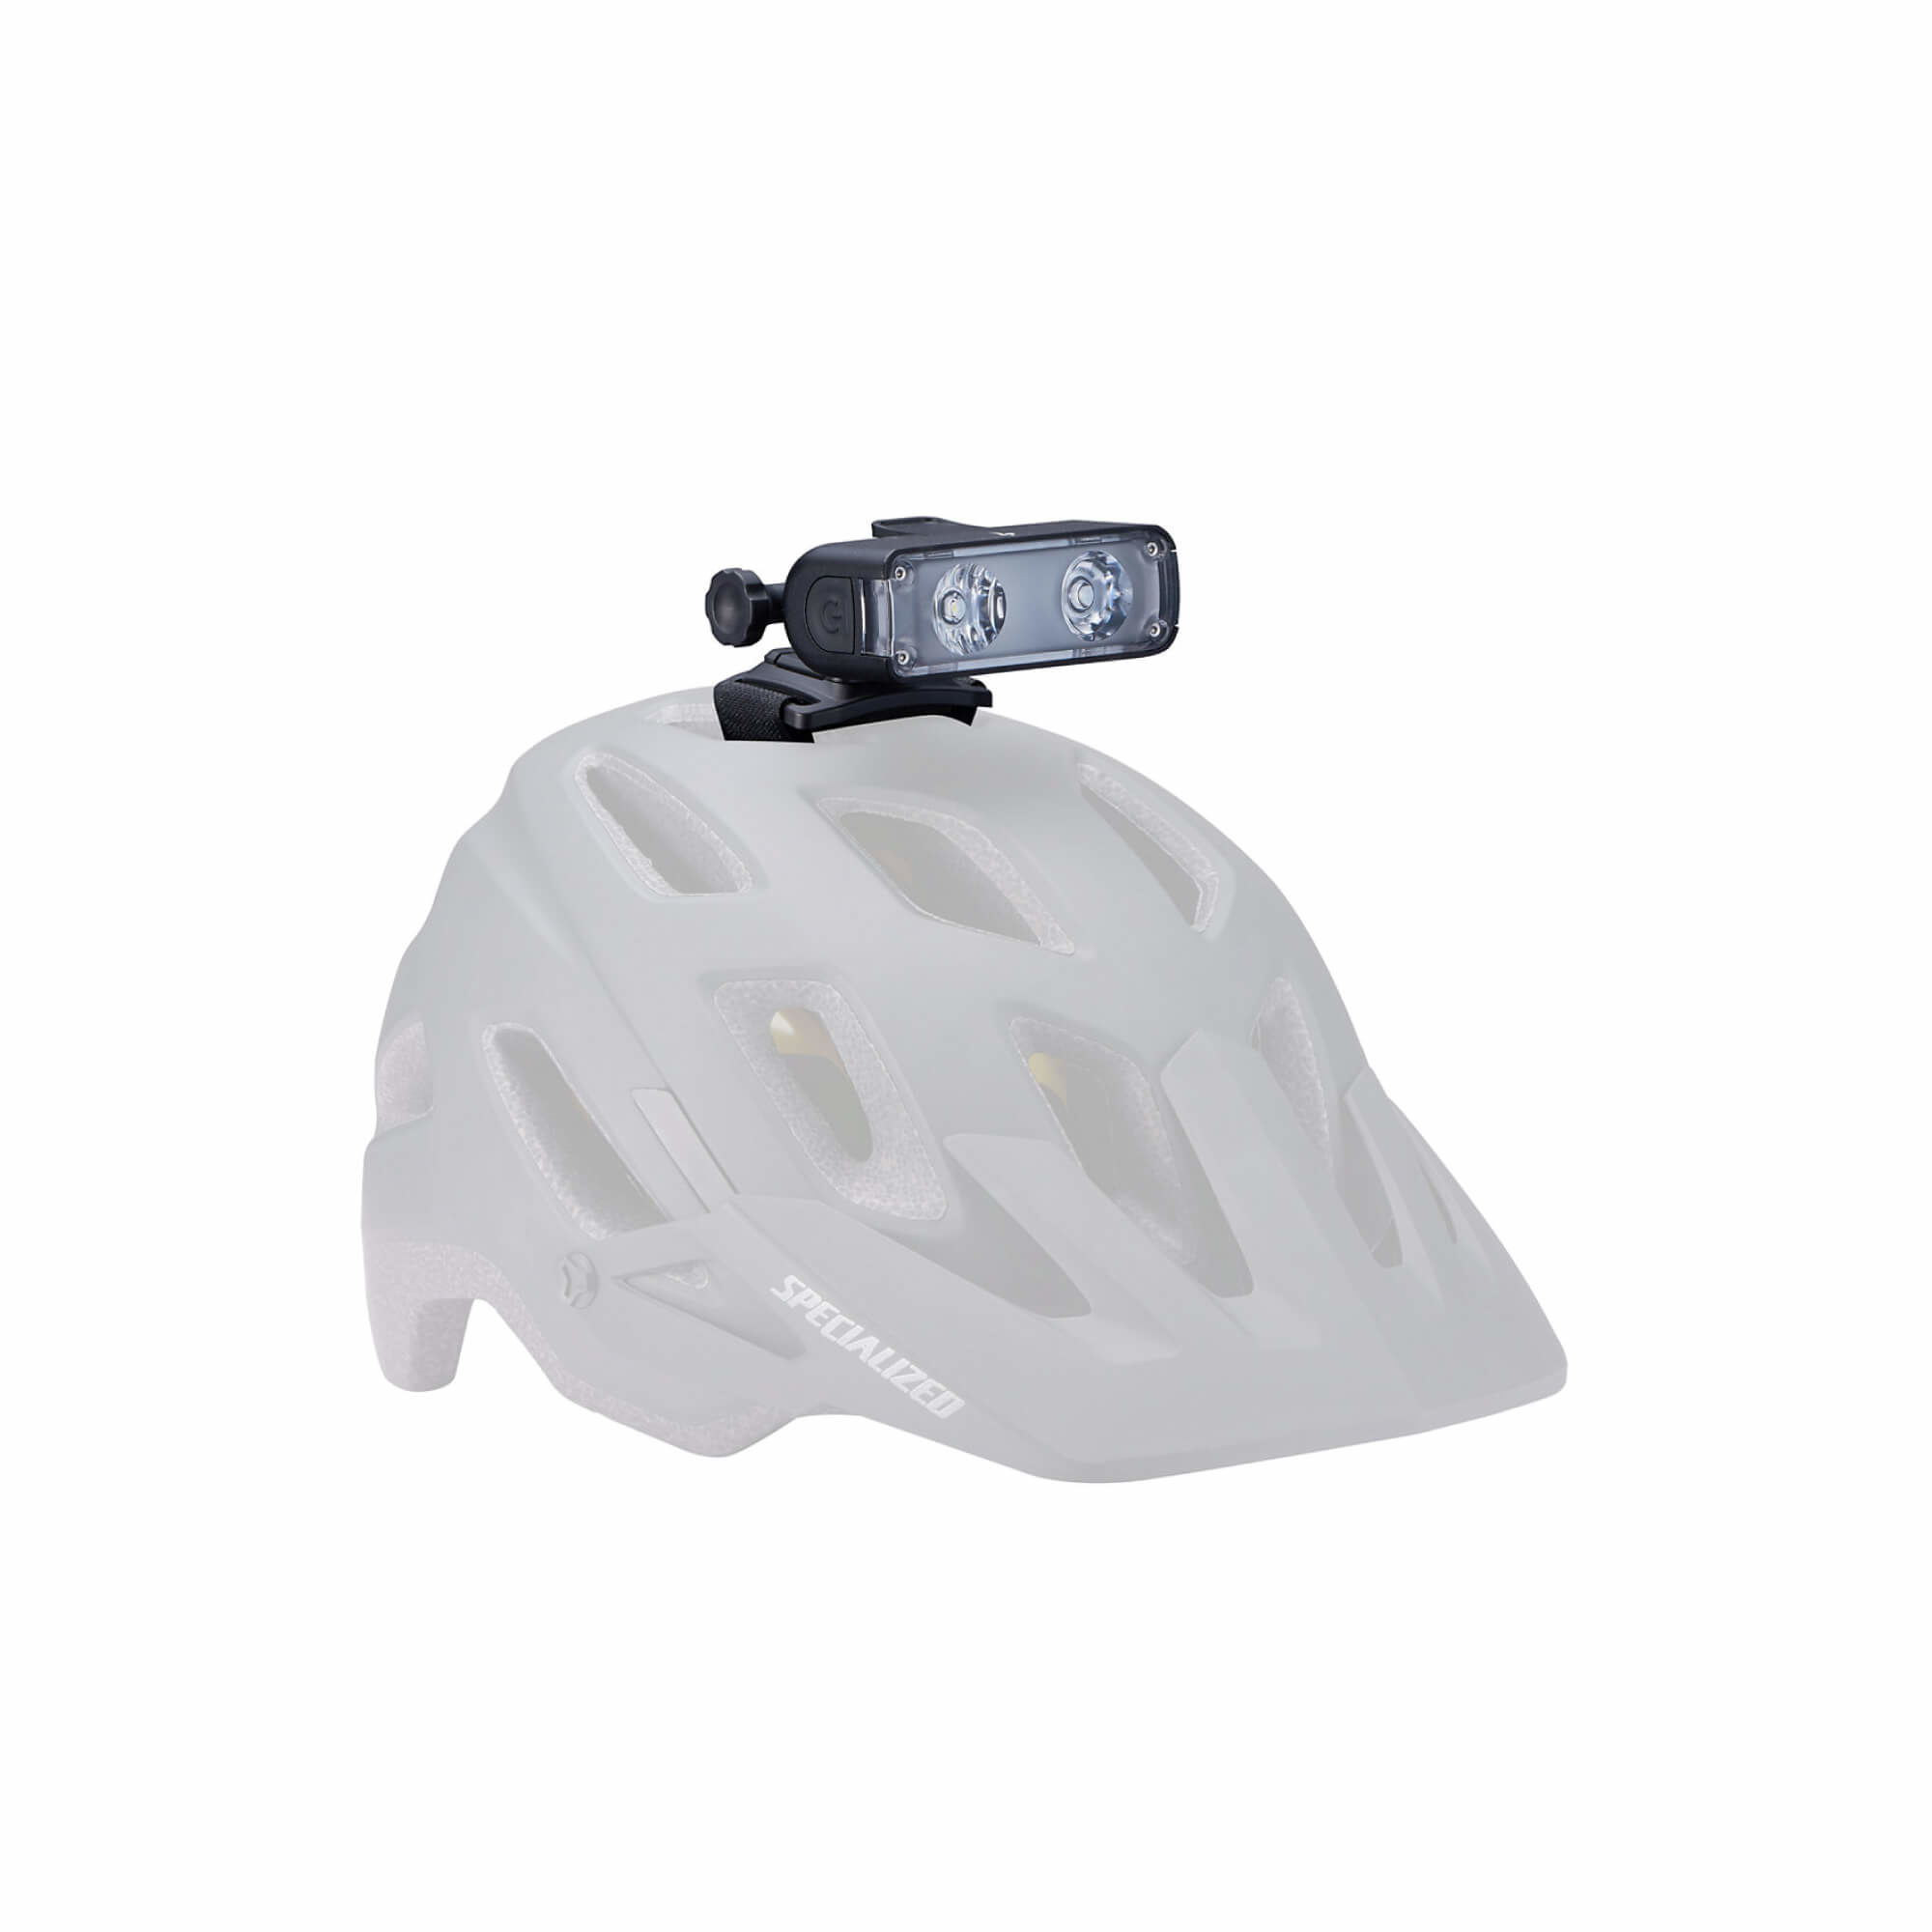 Flux 800 Headlight-1